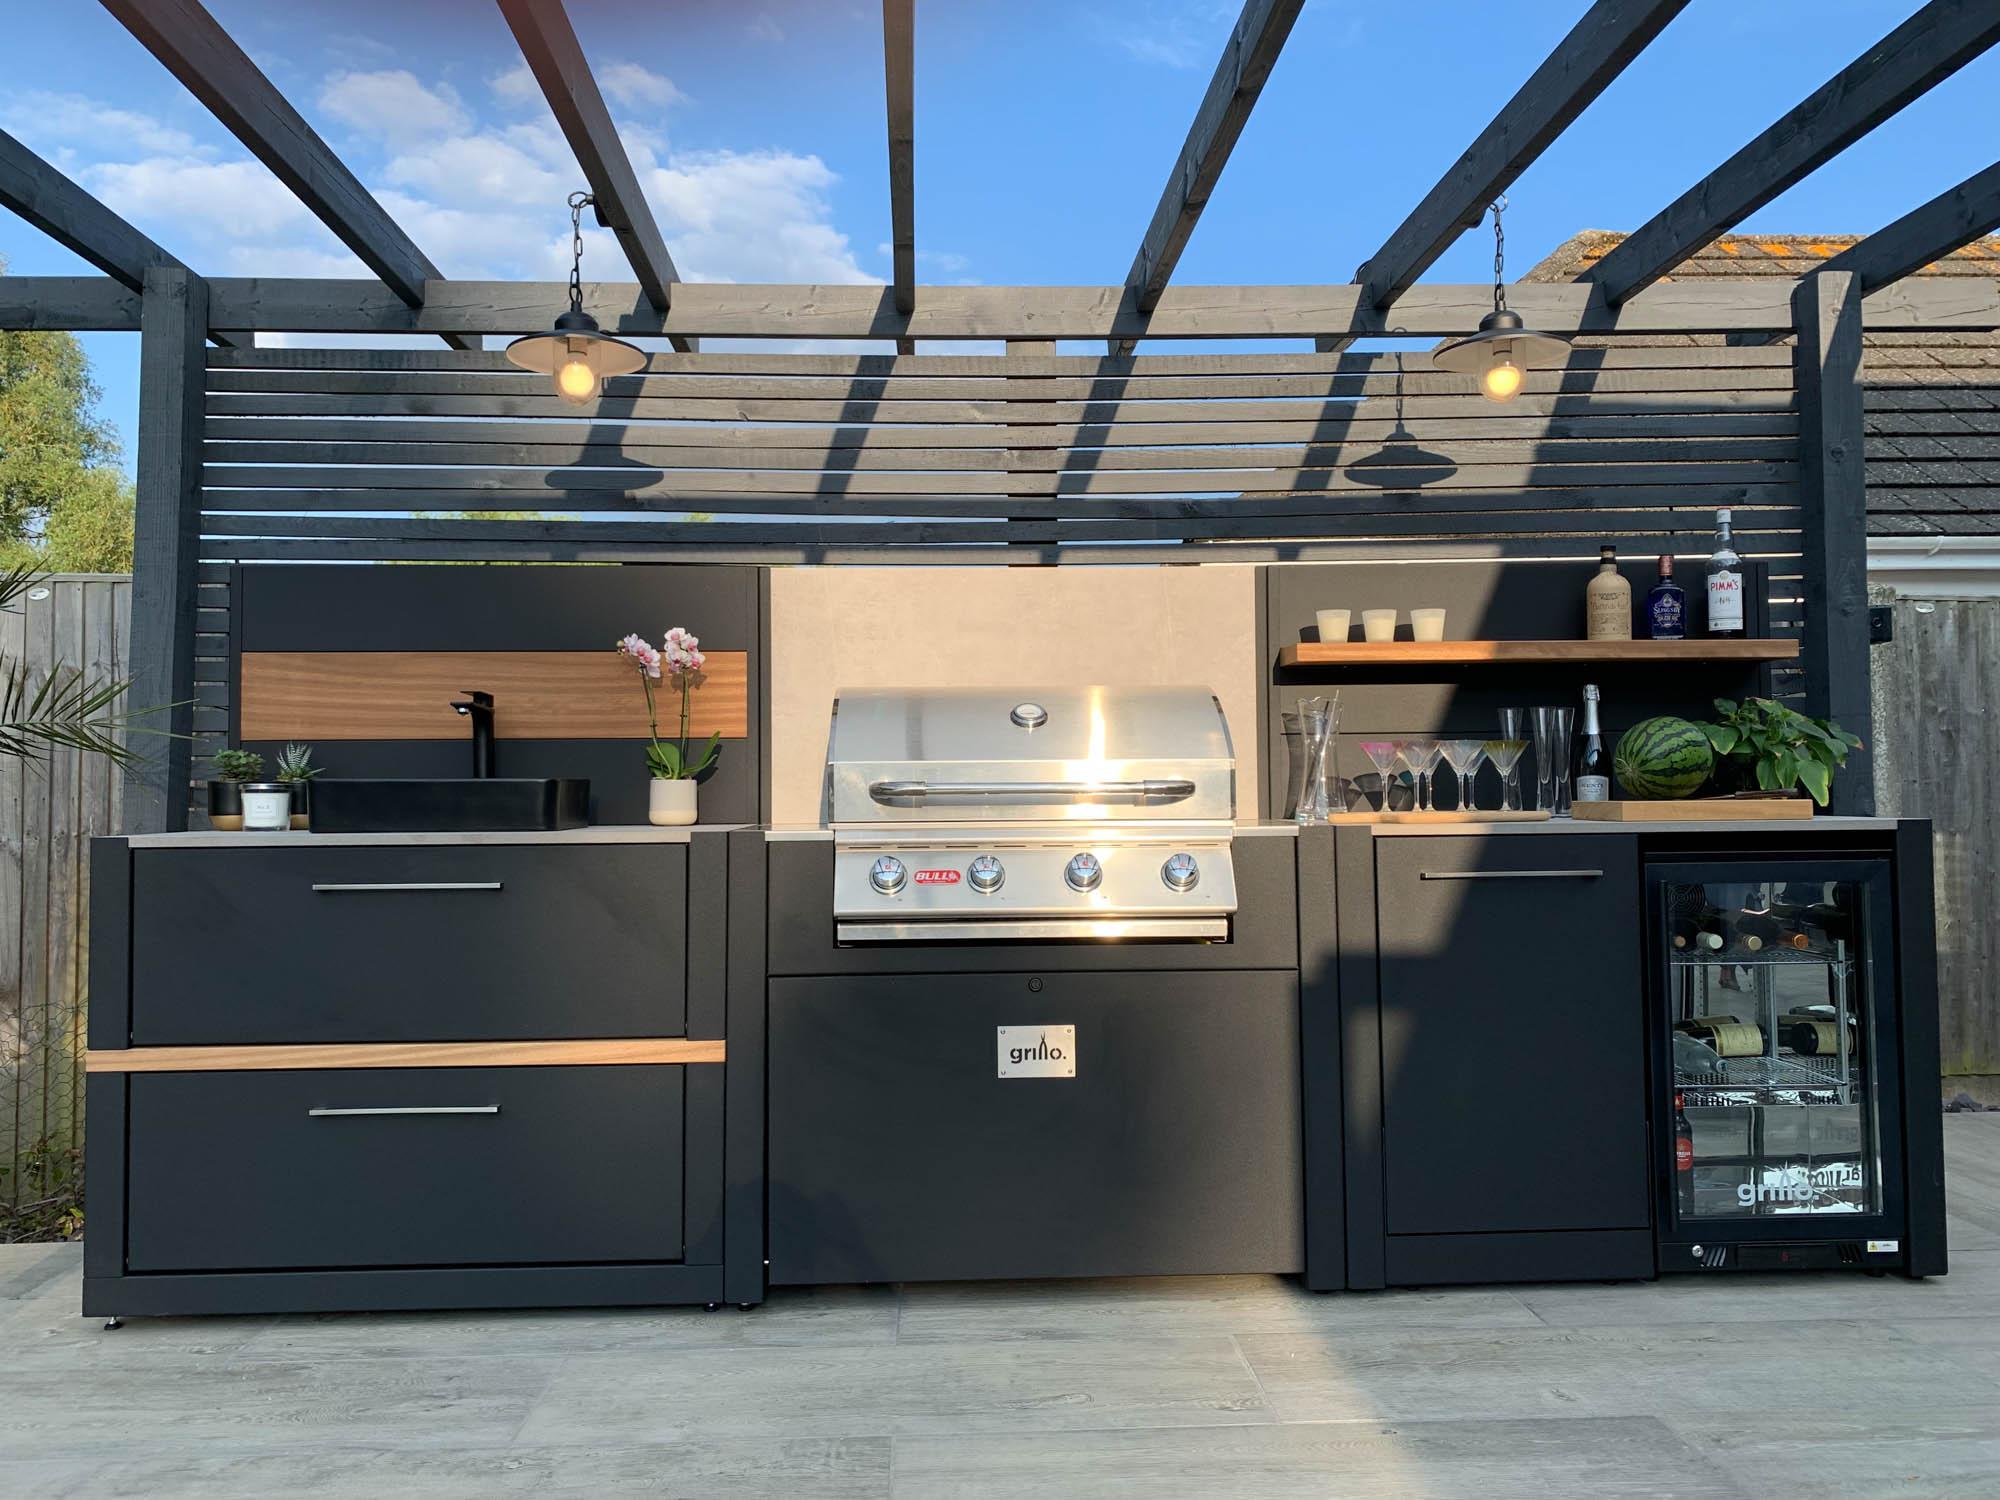 Competition project Horsham straight vantage gas bbq fridge